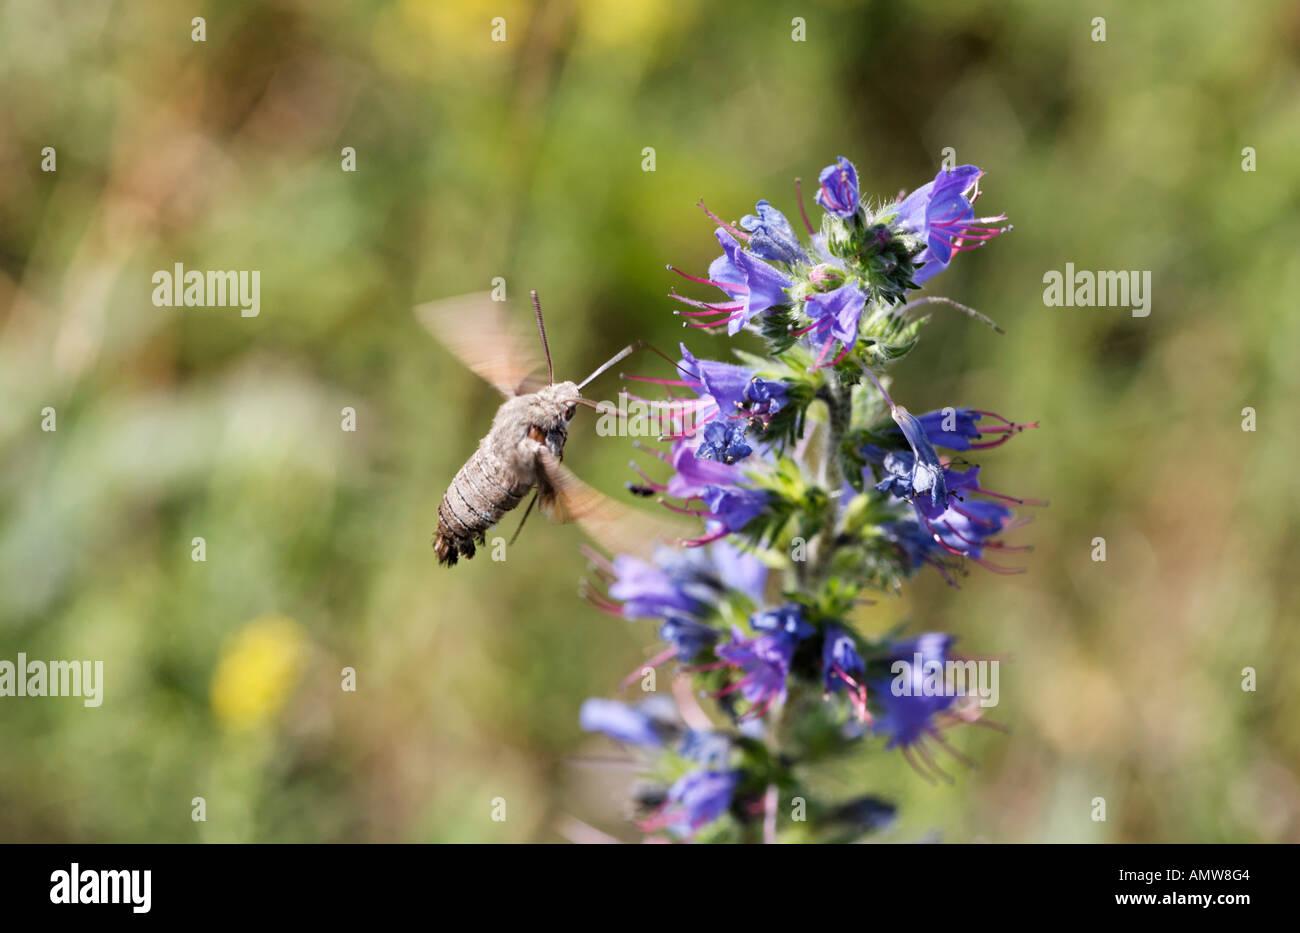 Humming-bird Hawk-moth (Macroglossum stellatarum) sur (Vipérine commune Echium vulgare), Allemagne Photo Stock